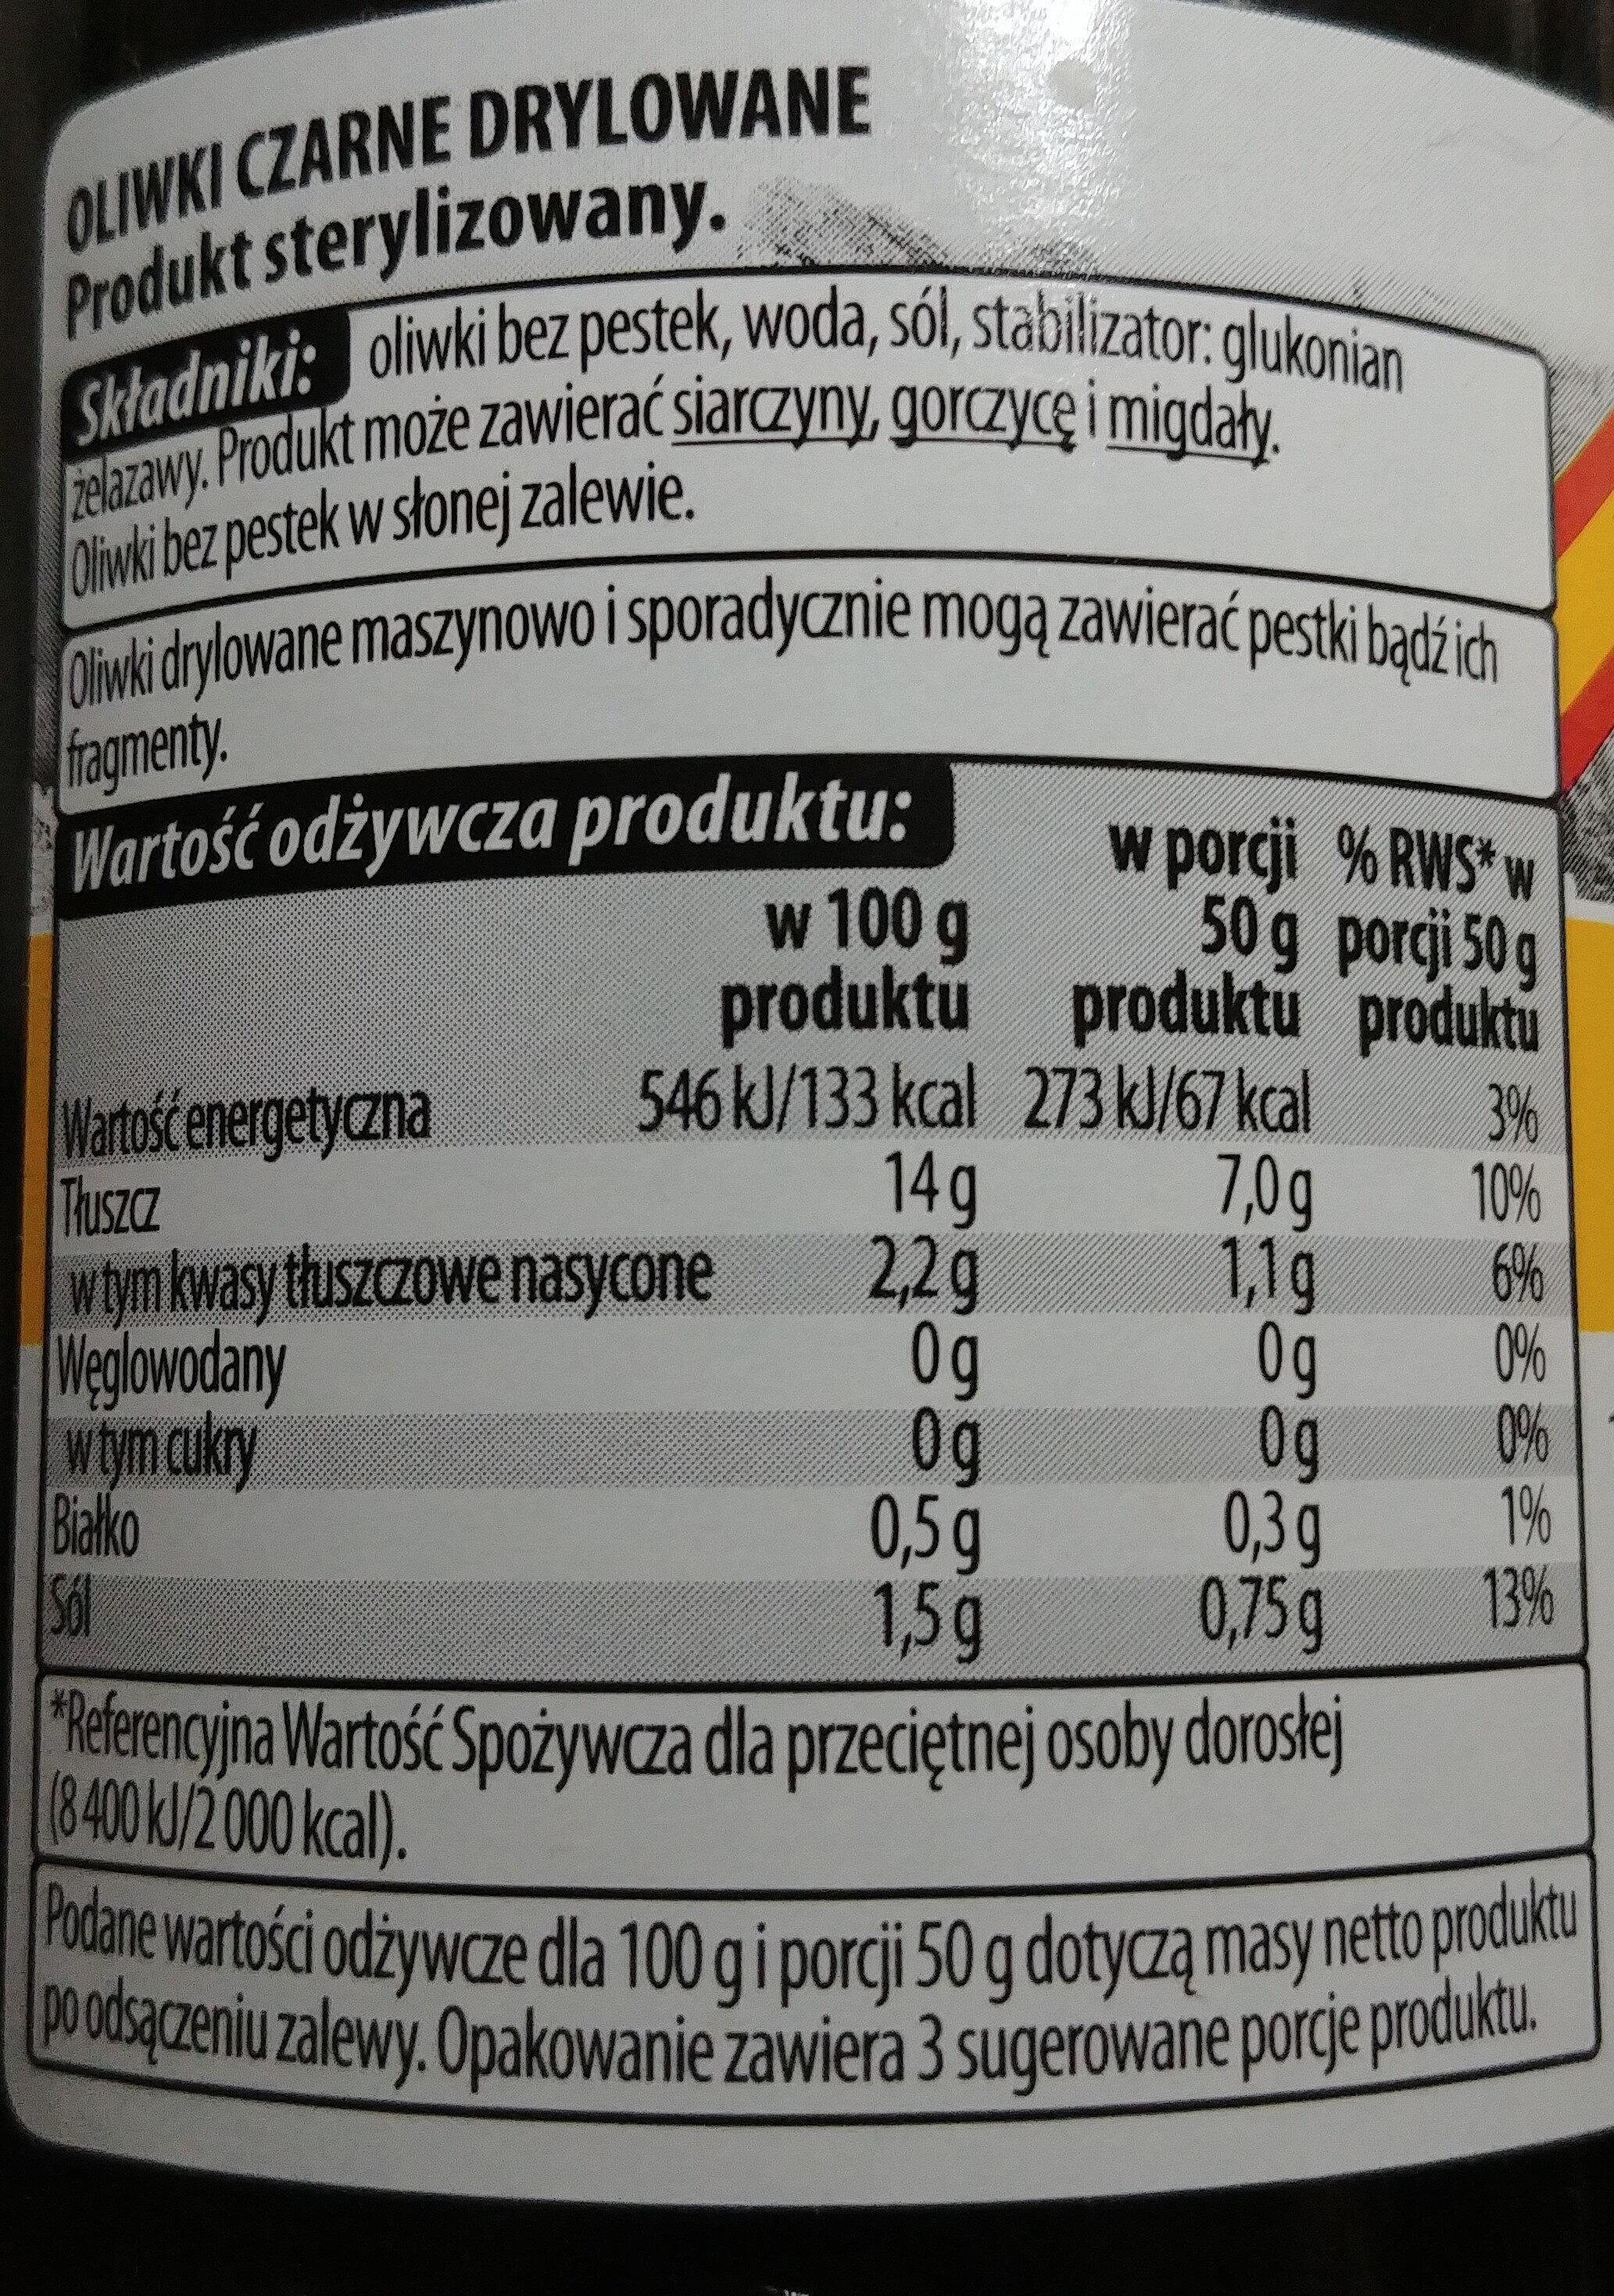 Oliwki czarne drylowane - Informations nutritionnelles - pl